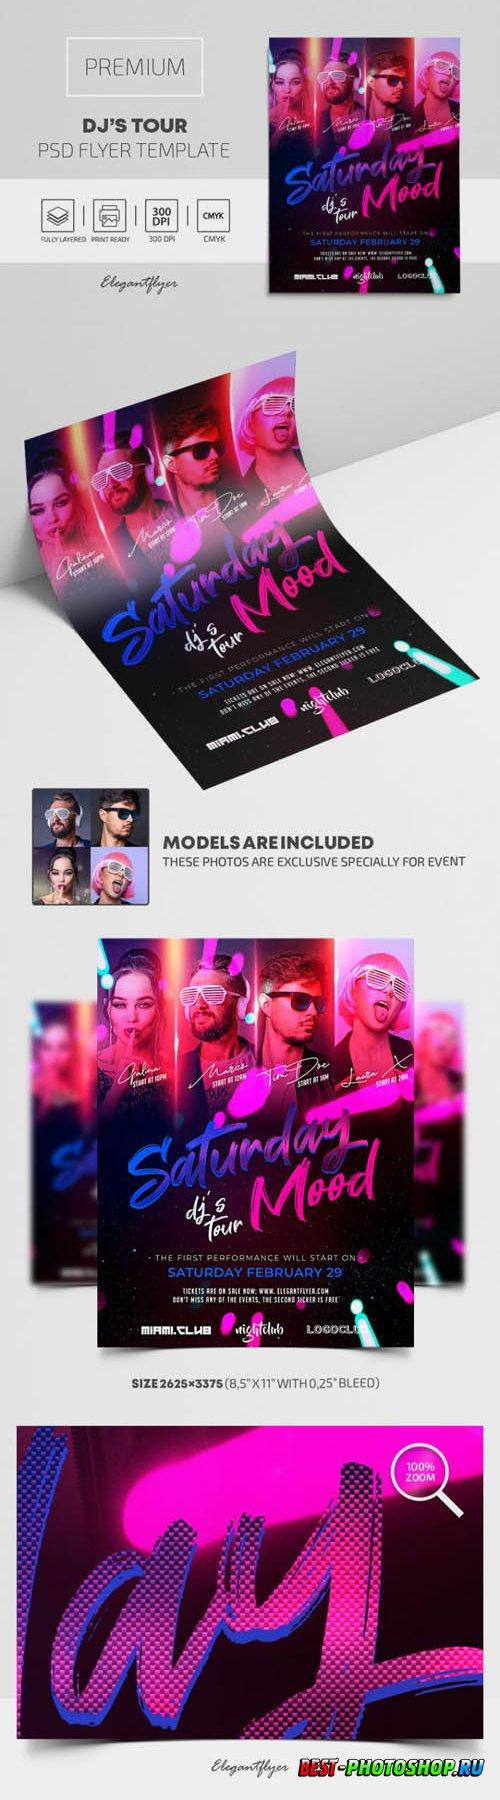 DJs Tour Premium PSD Flyer Template